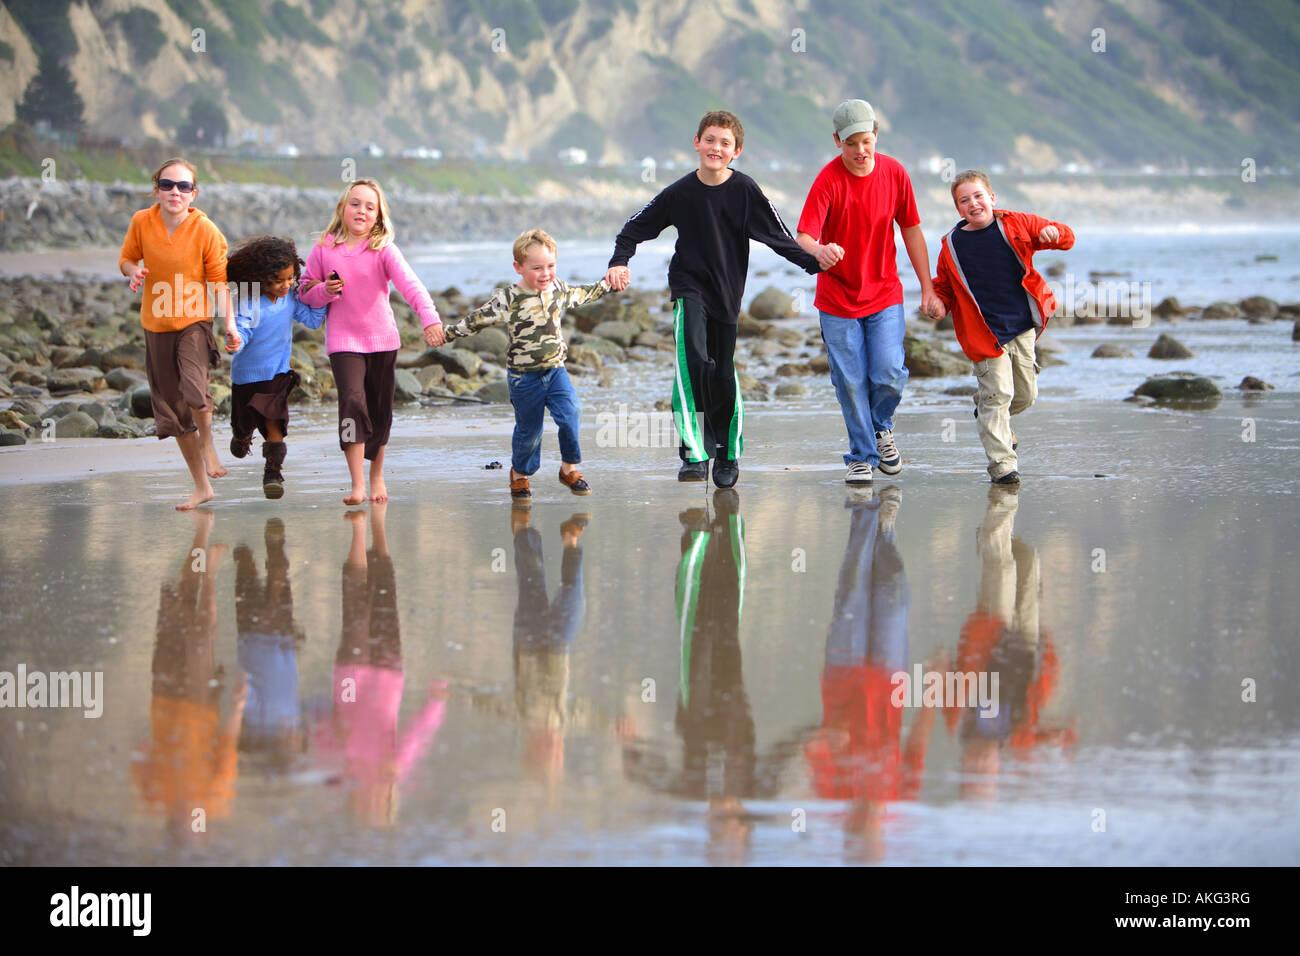 Children Running on Beach Mussel Shoals Carpenteria Santa Barbara County California United States (MR) Stock Photo